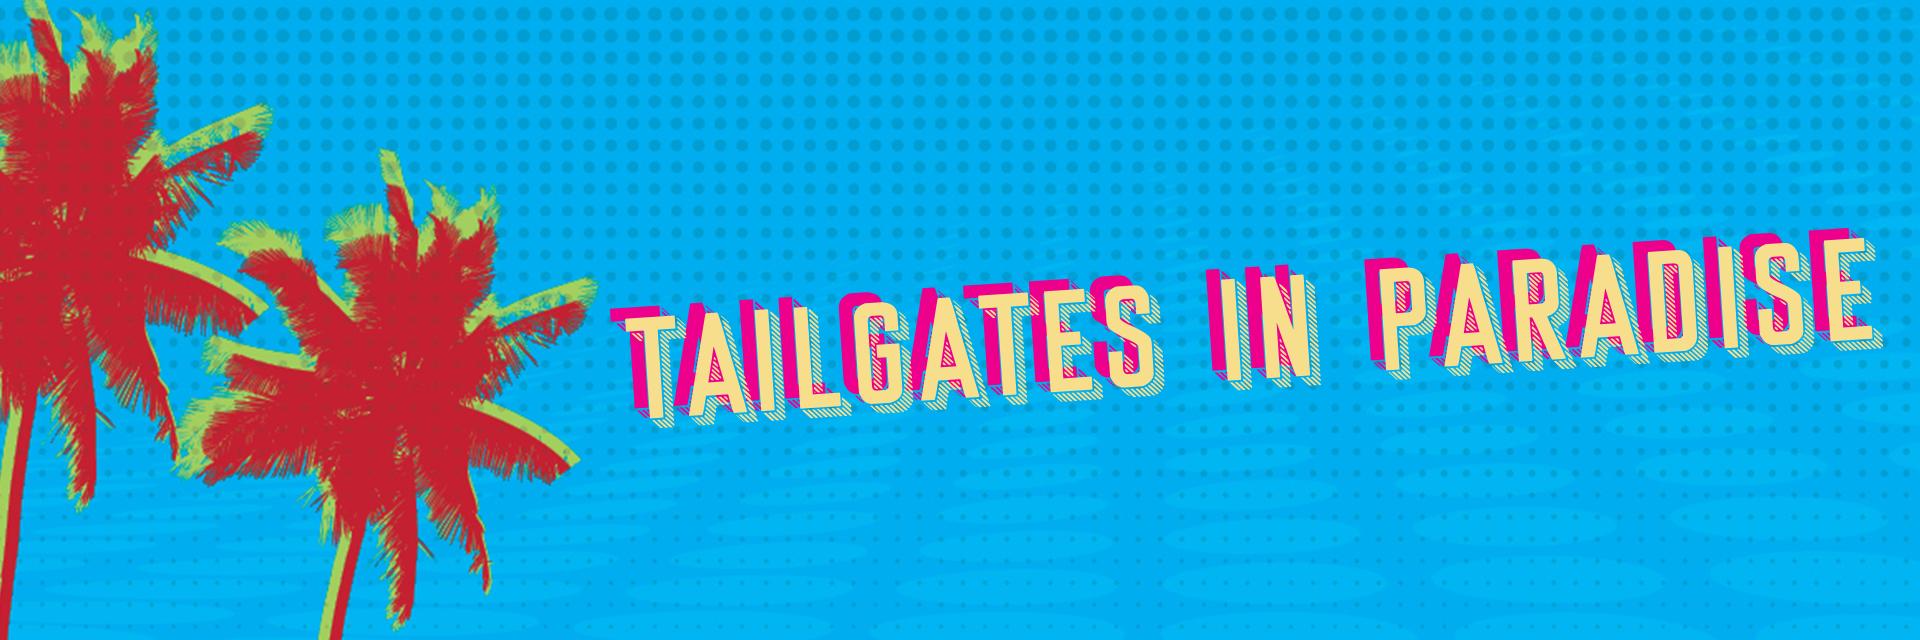 Register for Tailgates in Paradise!